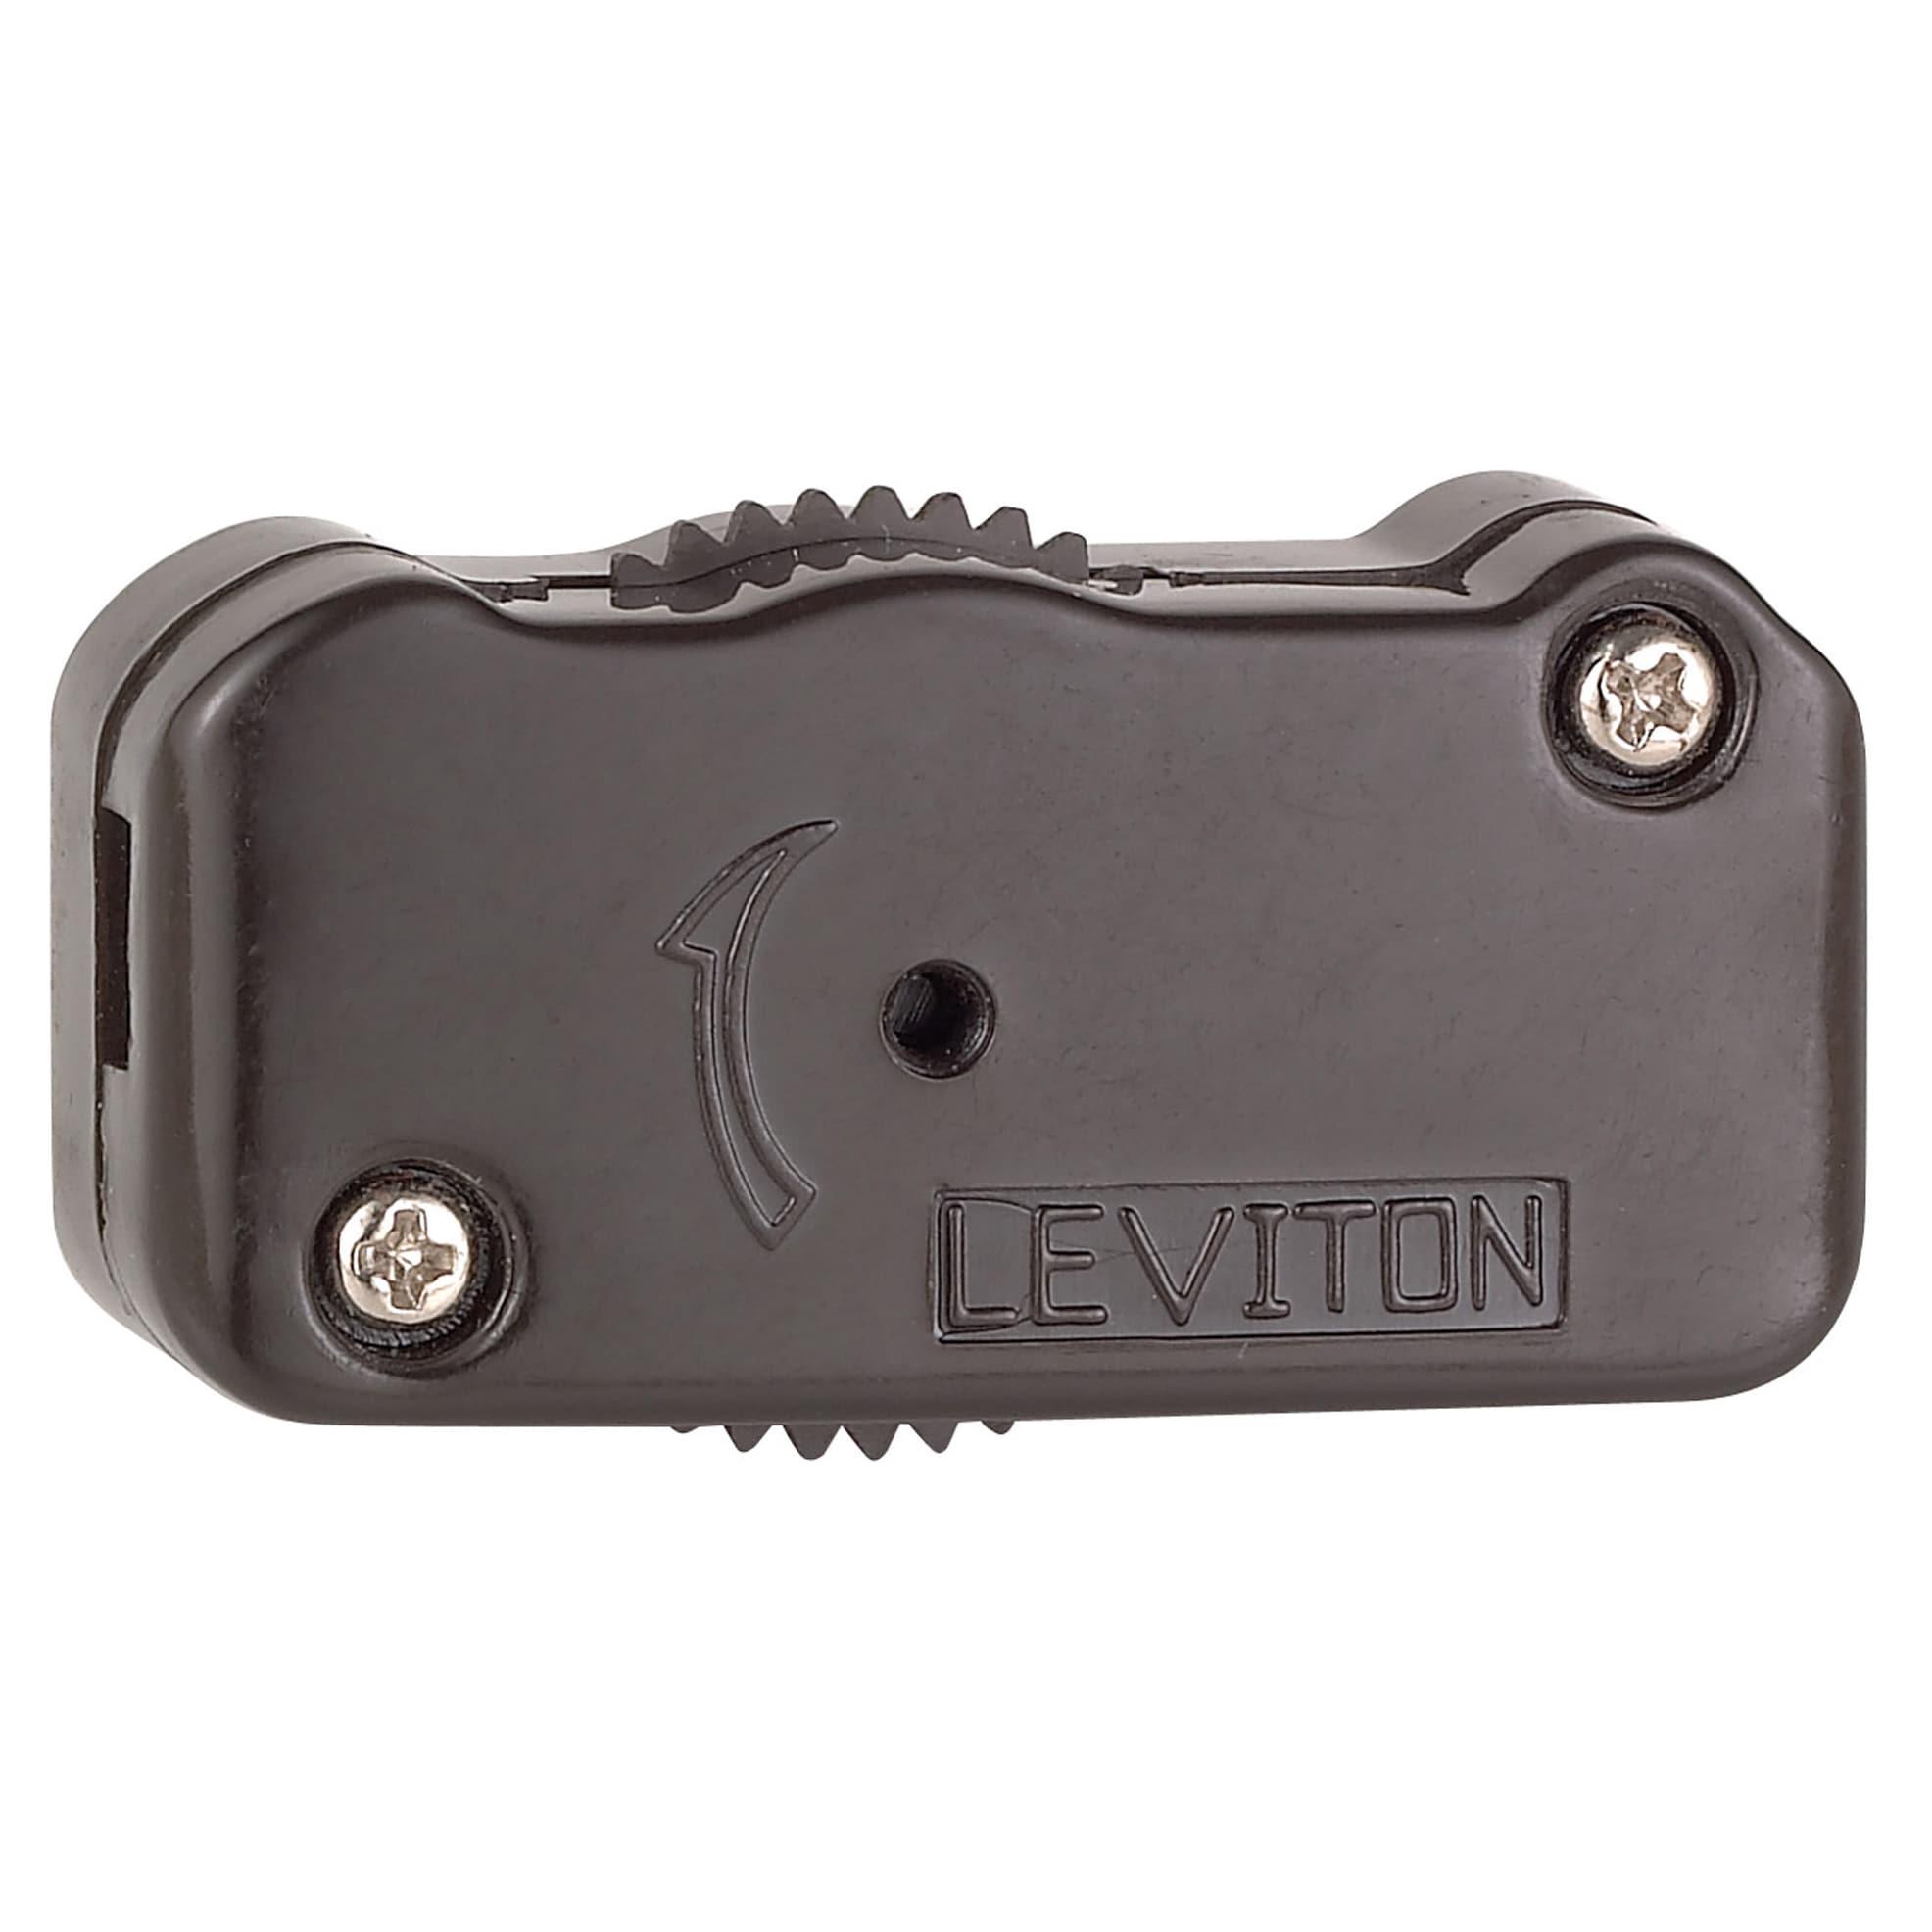 Shop Leviton C20-01420-000 Brown 200 Watt 3-Way Cord Switch - Free ...